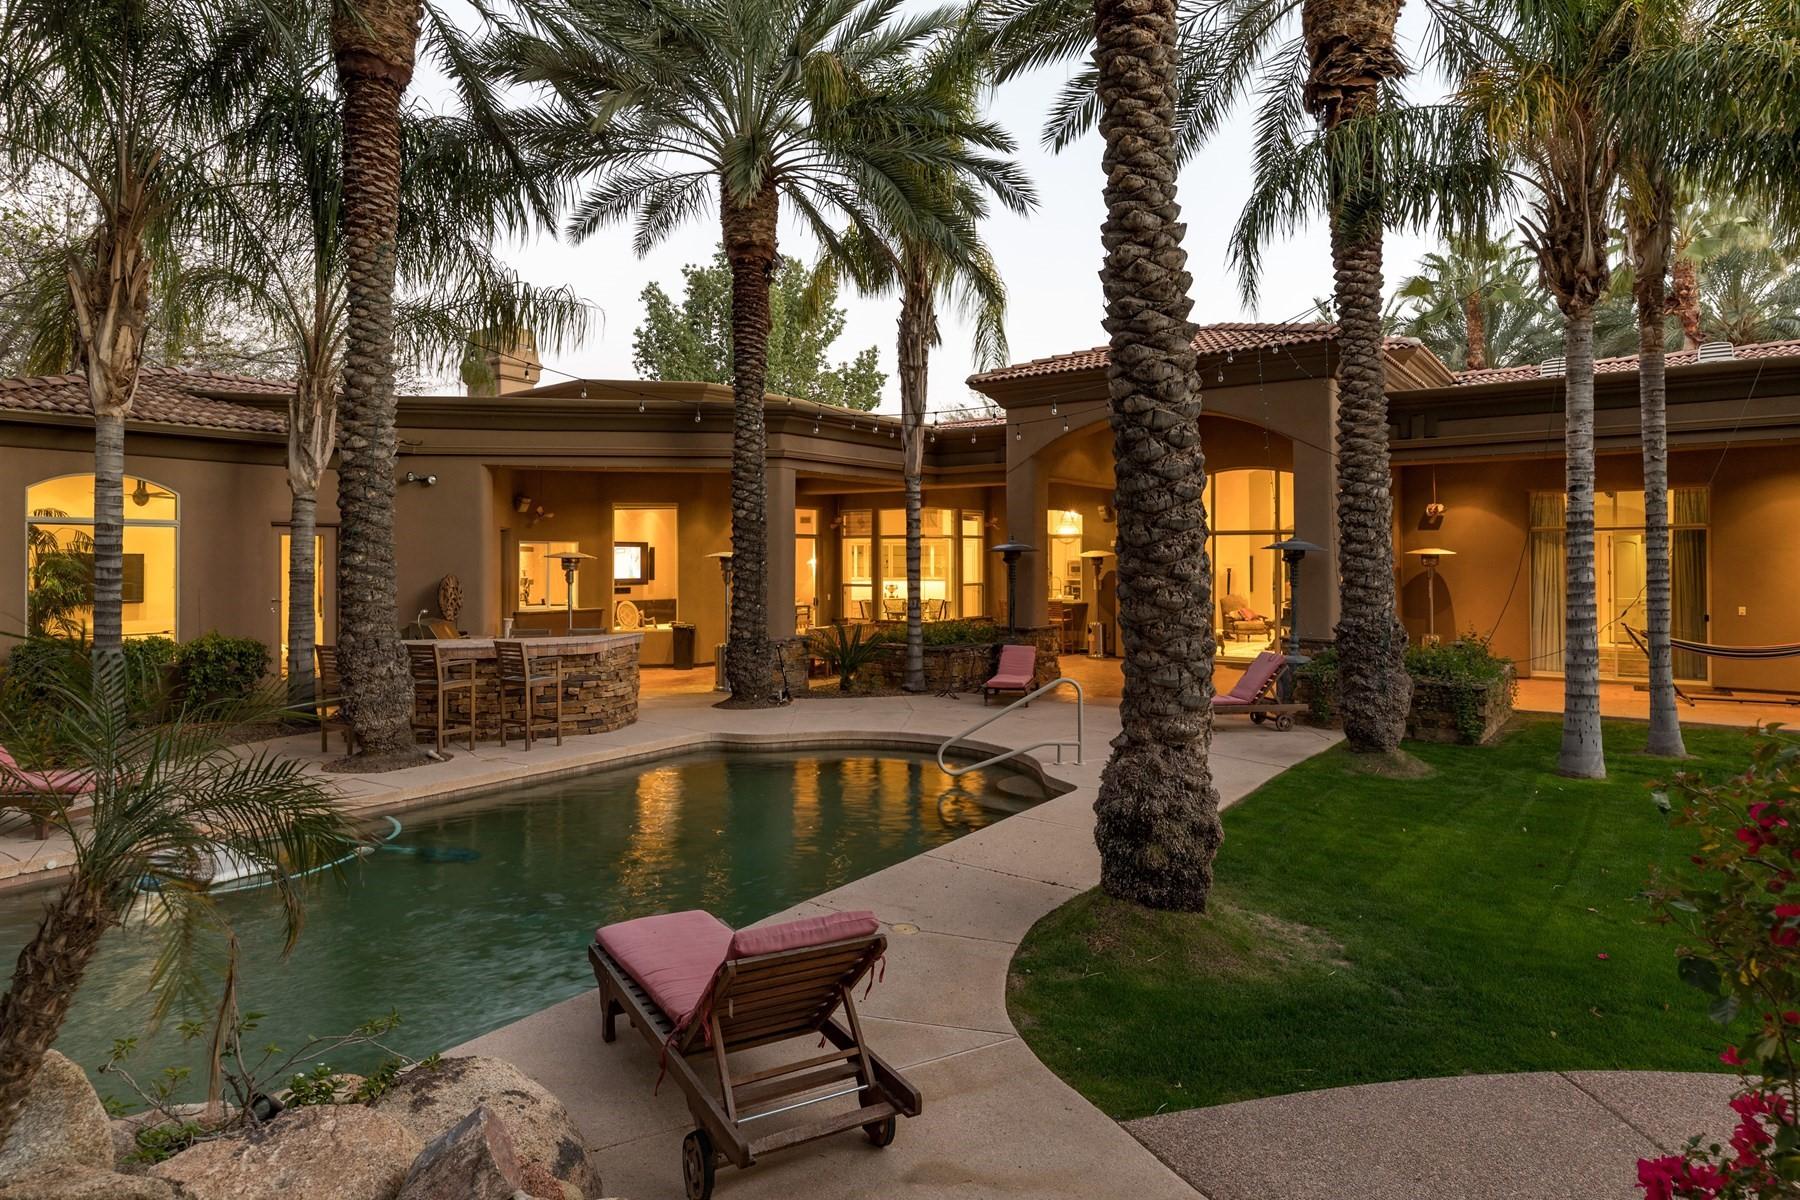 Casa para uma família para Venda às Exquisite and fully remodeled masterpiece in prestigious gated Cheney Place 7407 N 71st Pl Paradise Valley, Arizona, 85253 Estados Unidos